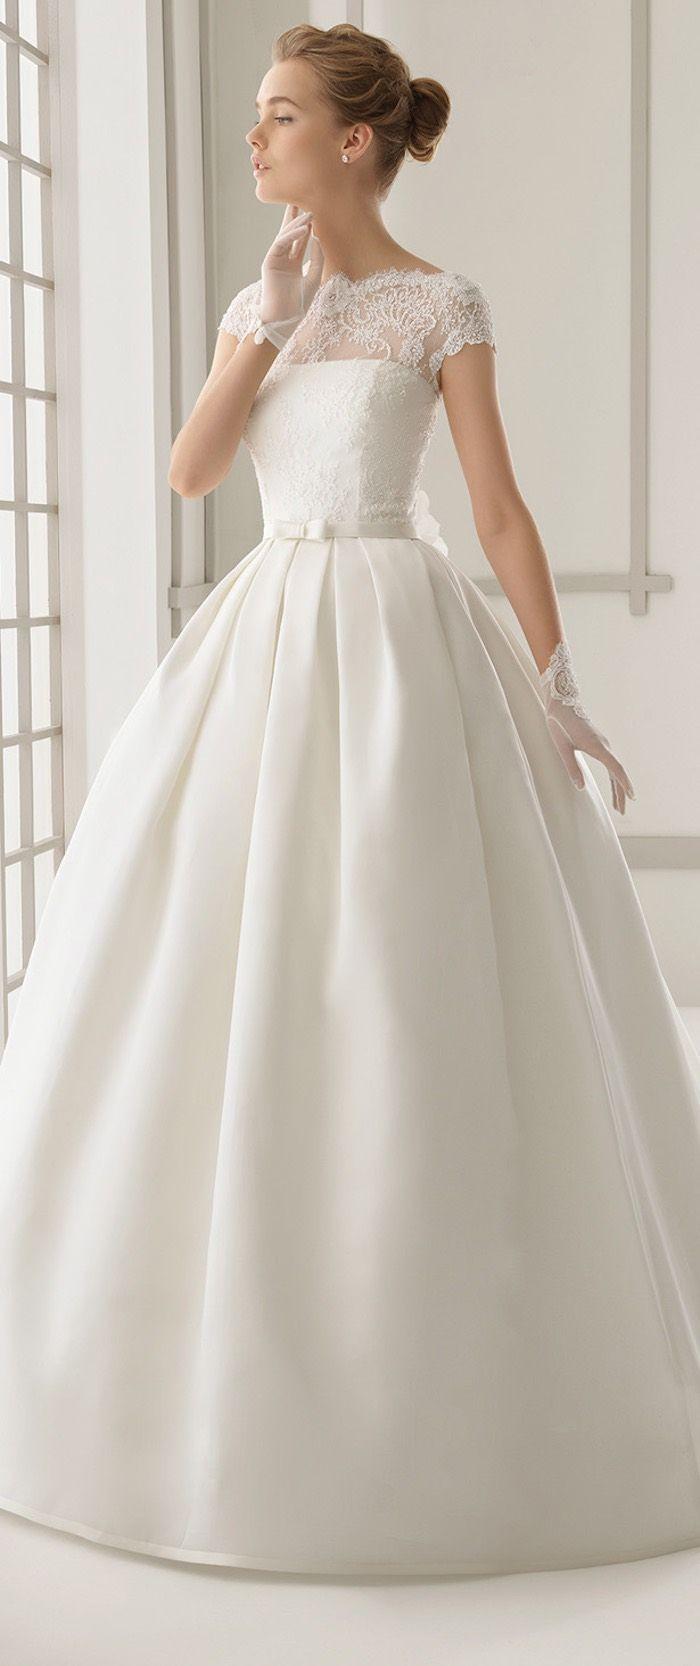 Modest Wedding Dresses with Pretty Details | Modest wedding, Wedding ...